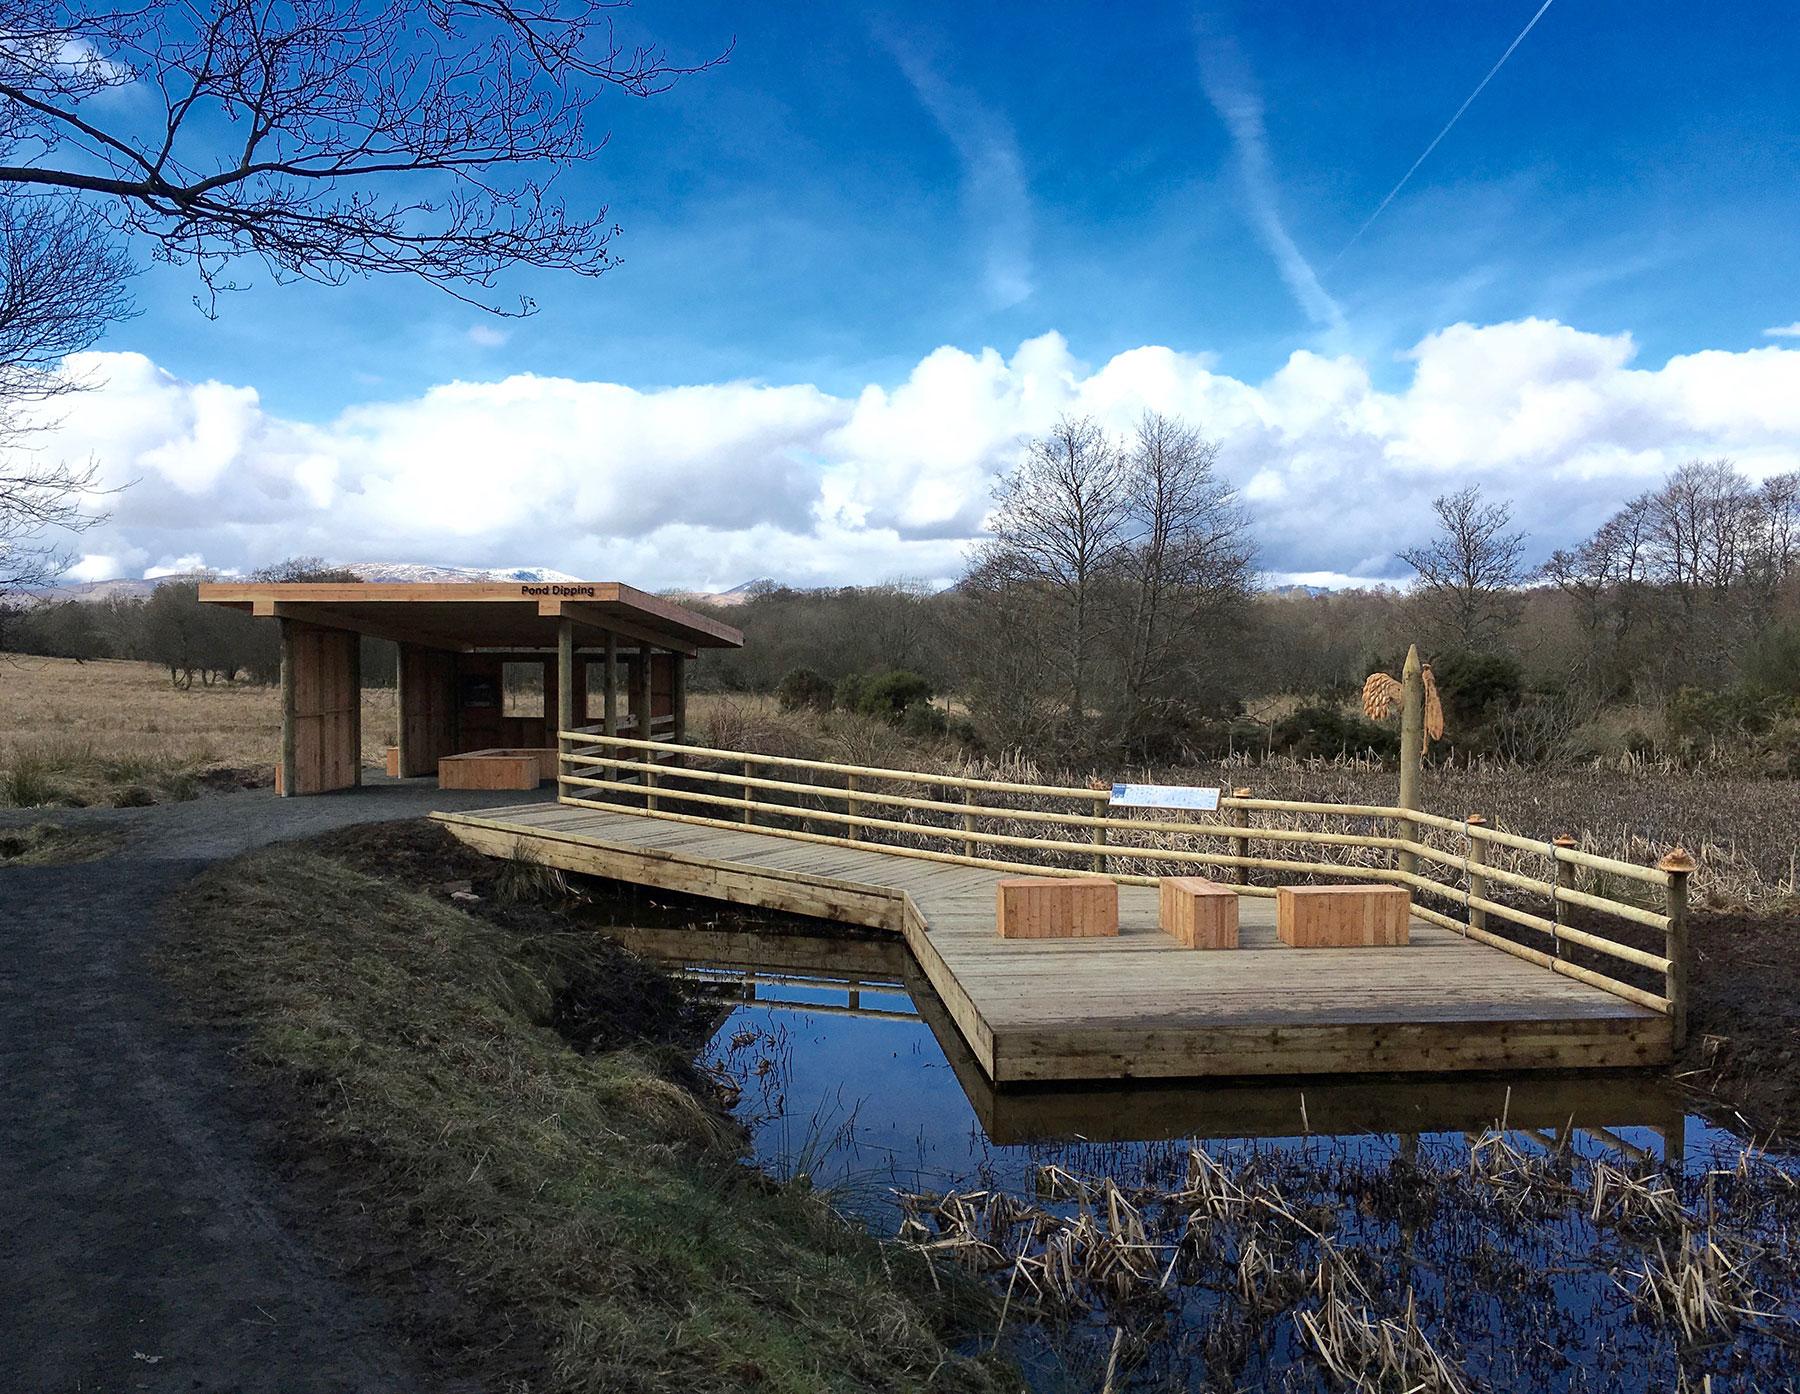 RSPB Pond Dipping Platform in Scotland